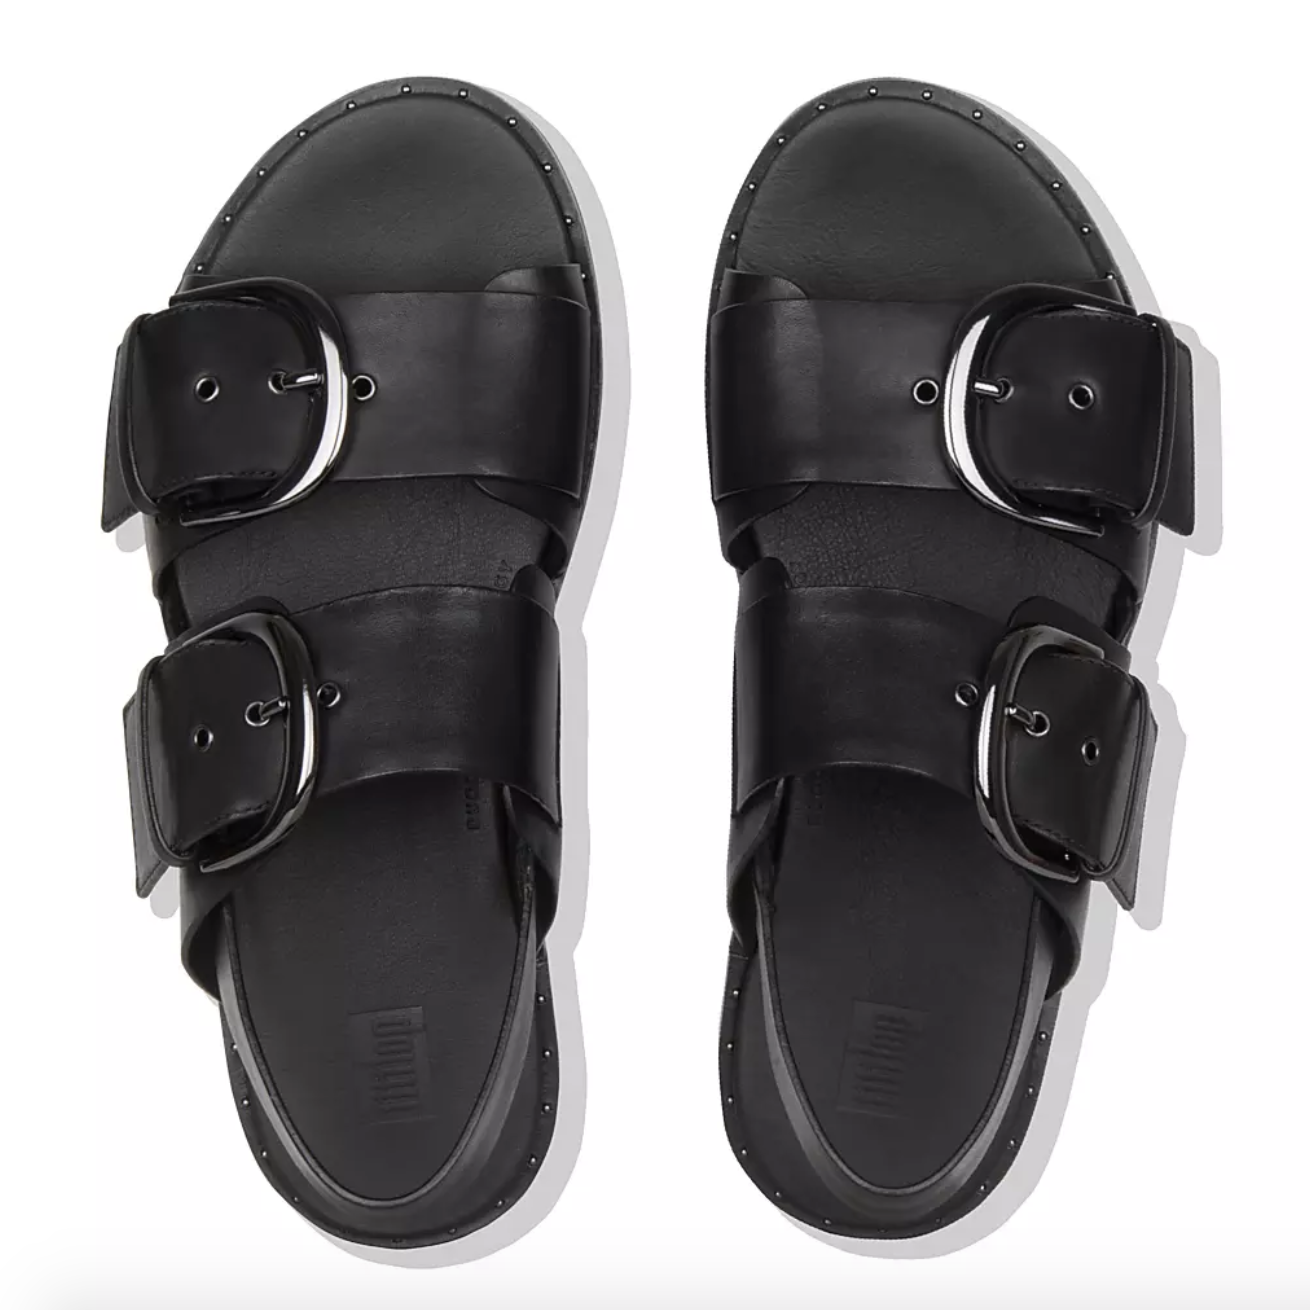 the black double strap sandals